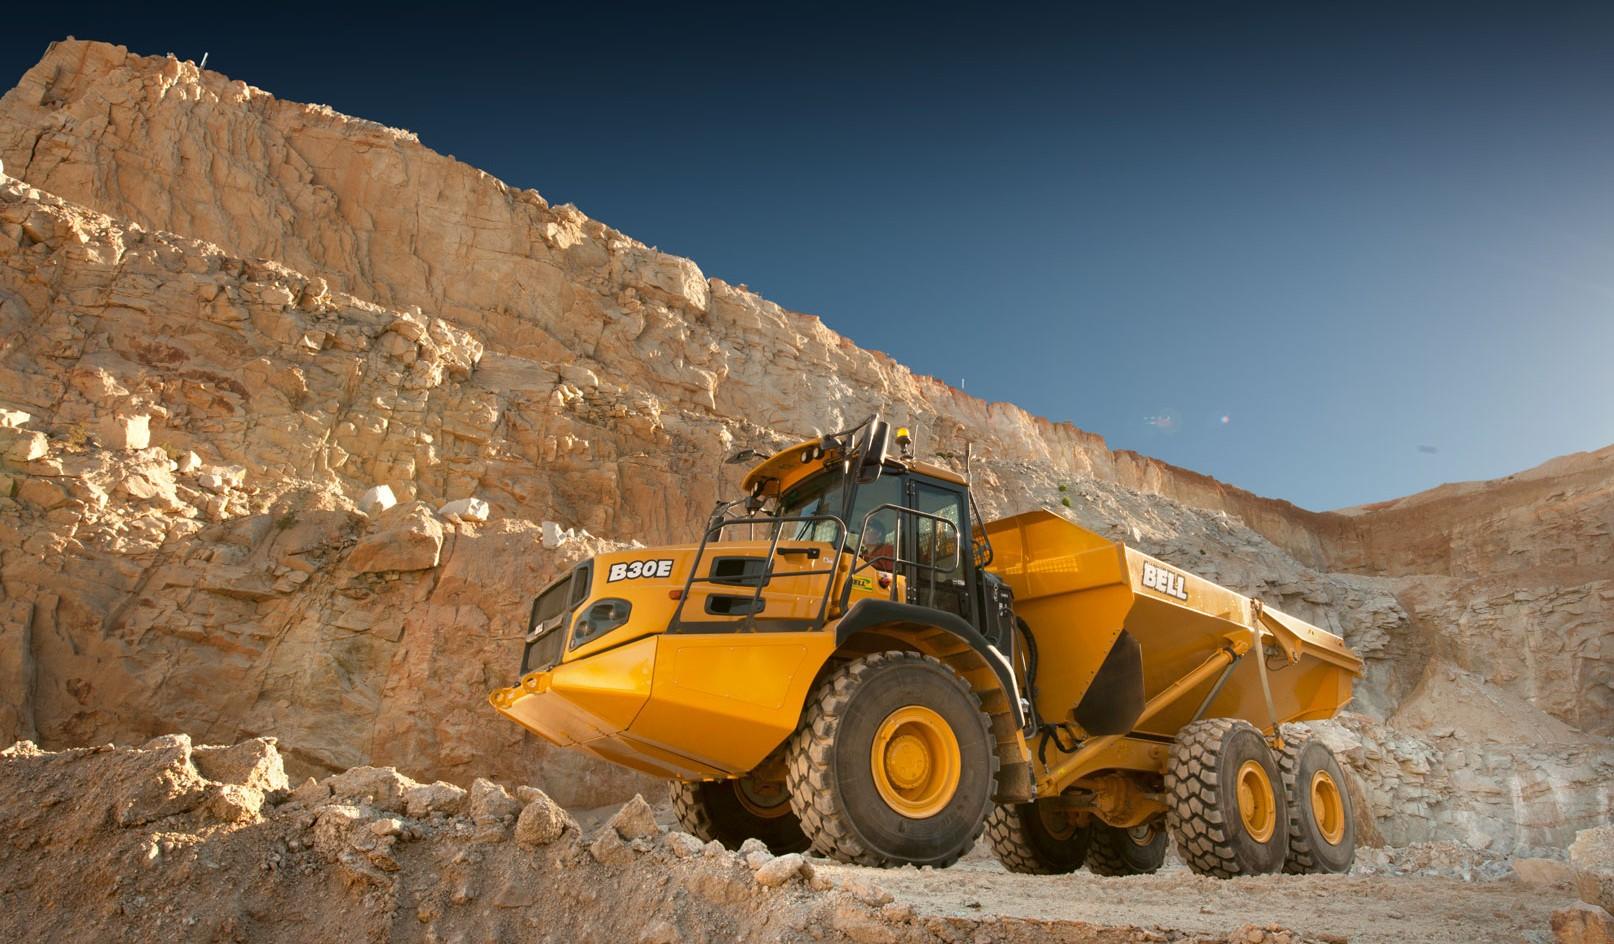 <div>industrial</div><div> <a href='http://www.nedmeldrum.com.au/project/hitachi-construction-machinery-bell-b30e/'>View Series</a></div>